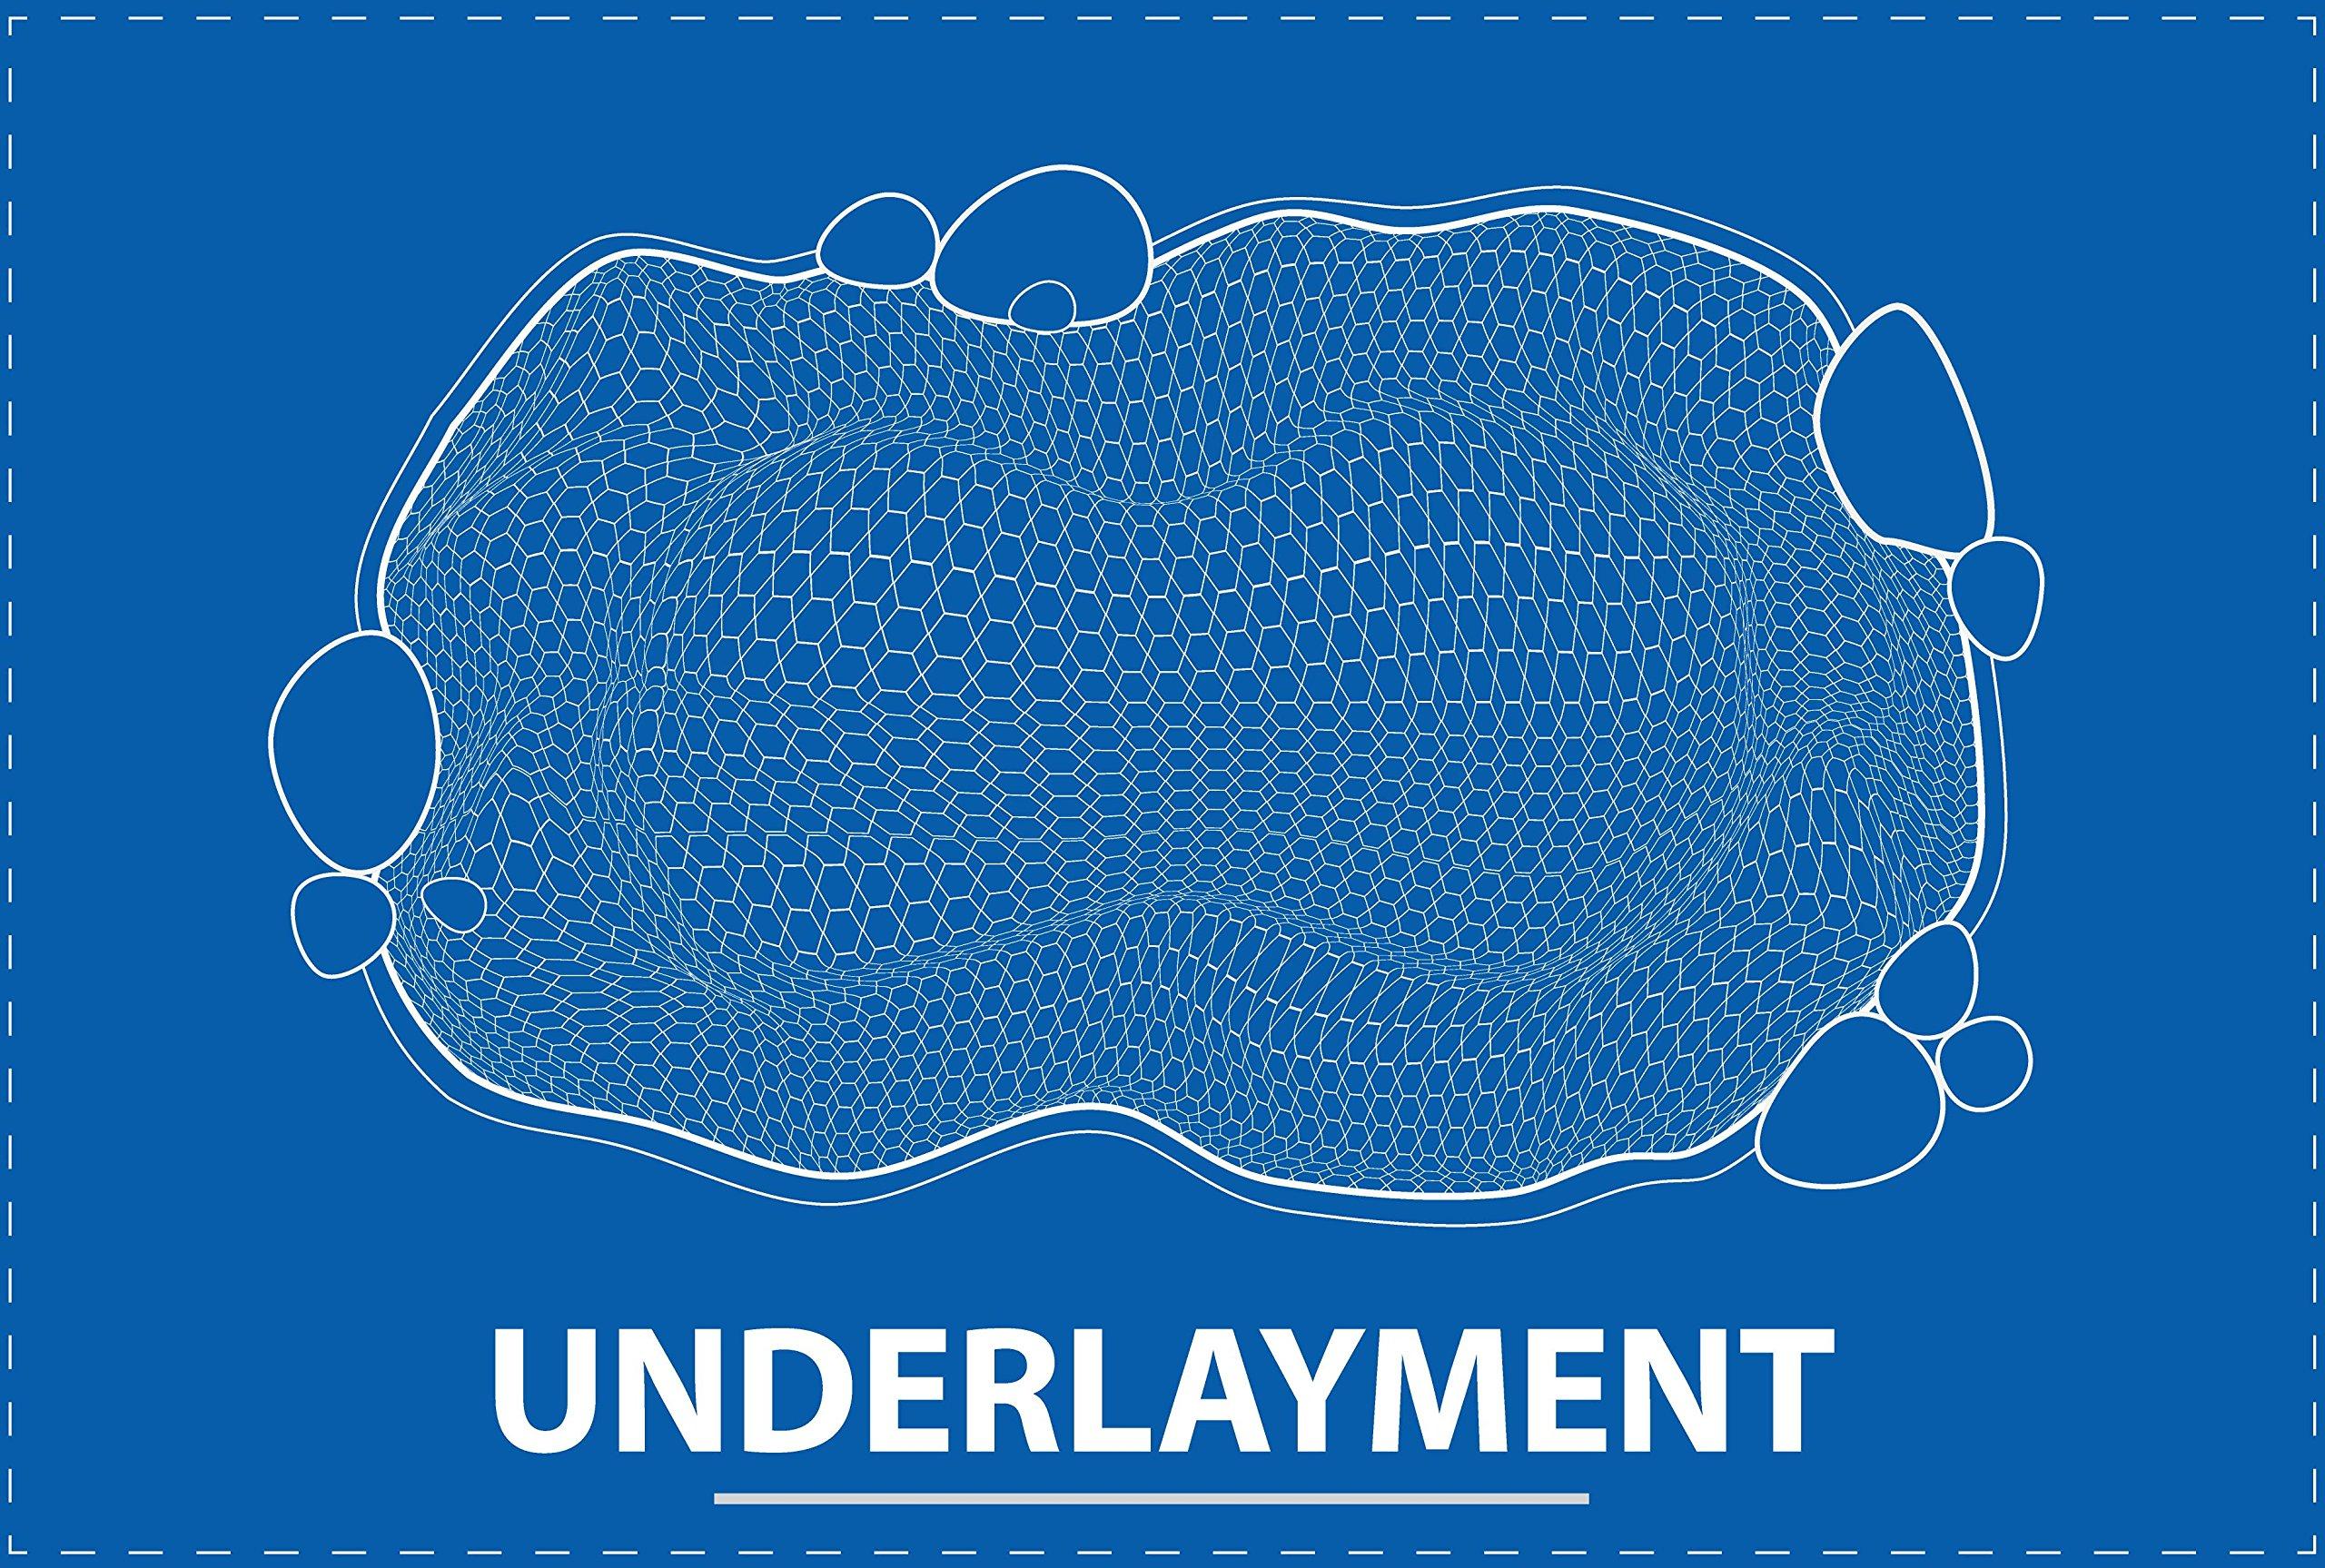 20 ft. x 35 ft. UnderGuard Geotextile Underlayment by UnderGuard